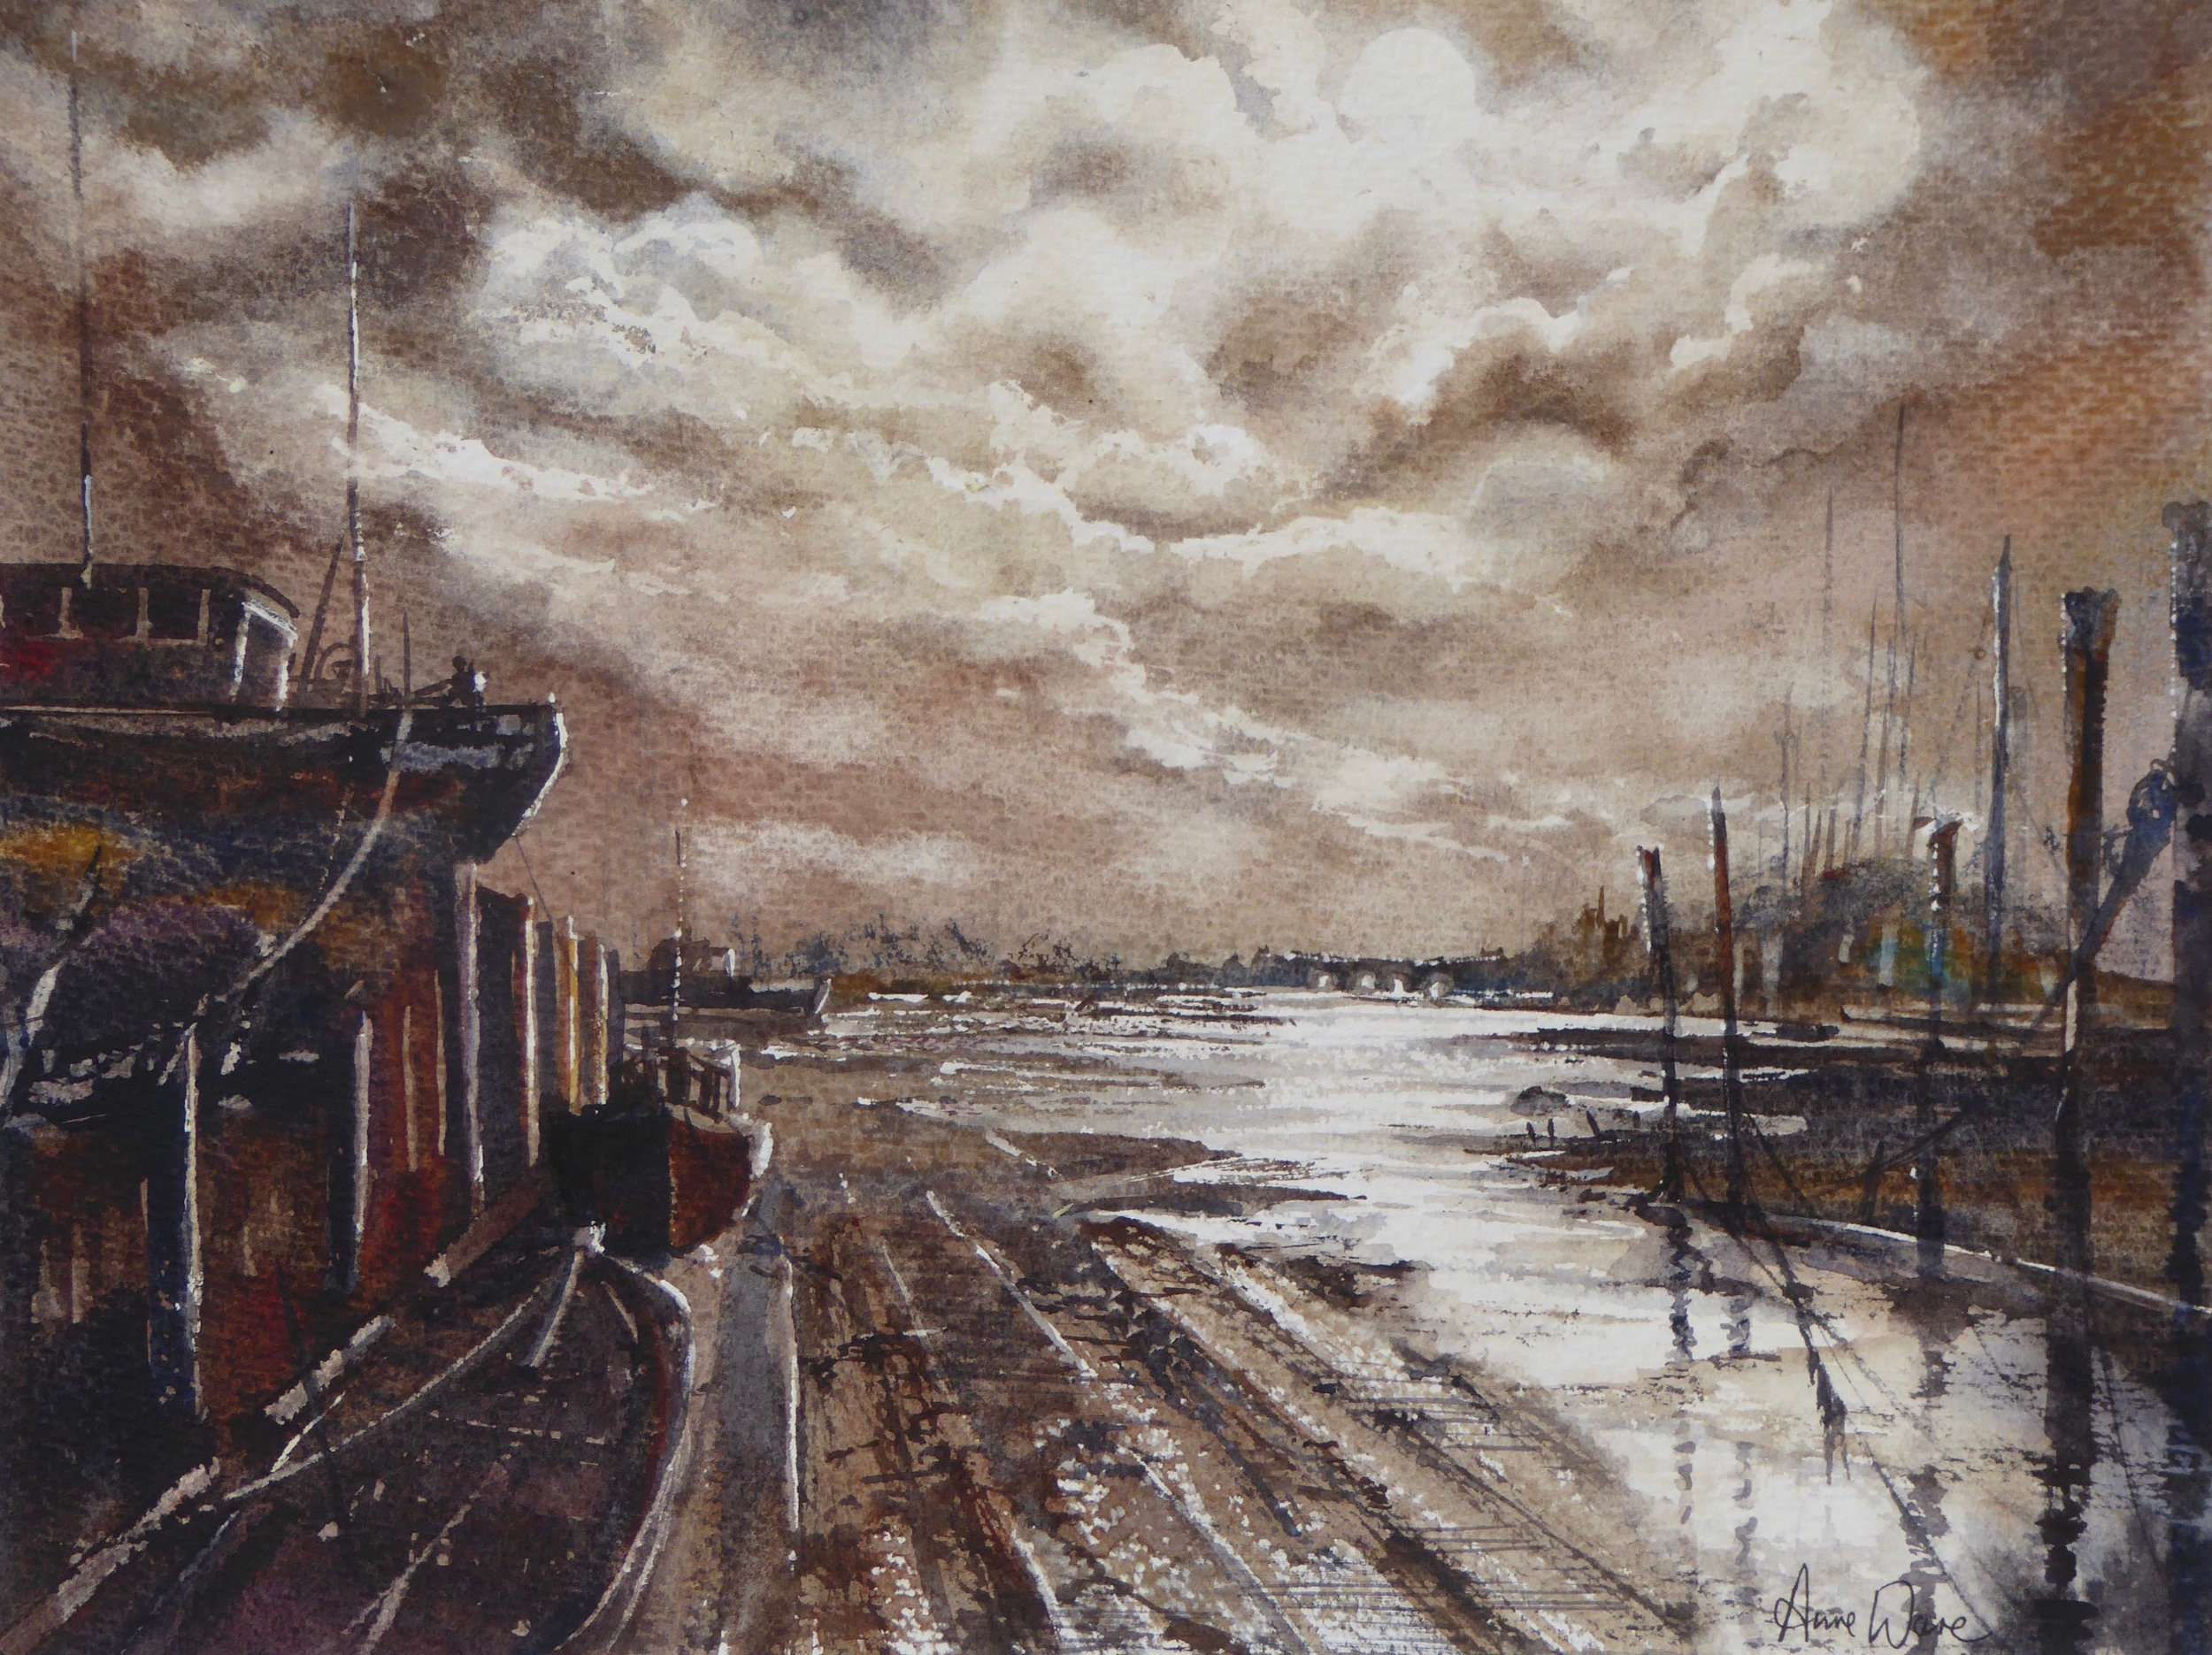 Watercolour Prize Winner (£200 Jackson's Art Gift Voucher): 'Estuary Light' by Anne Ware.  Read more about the artwork.